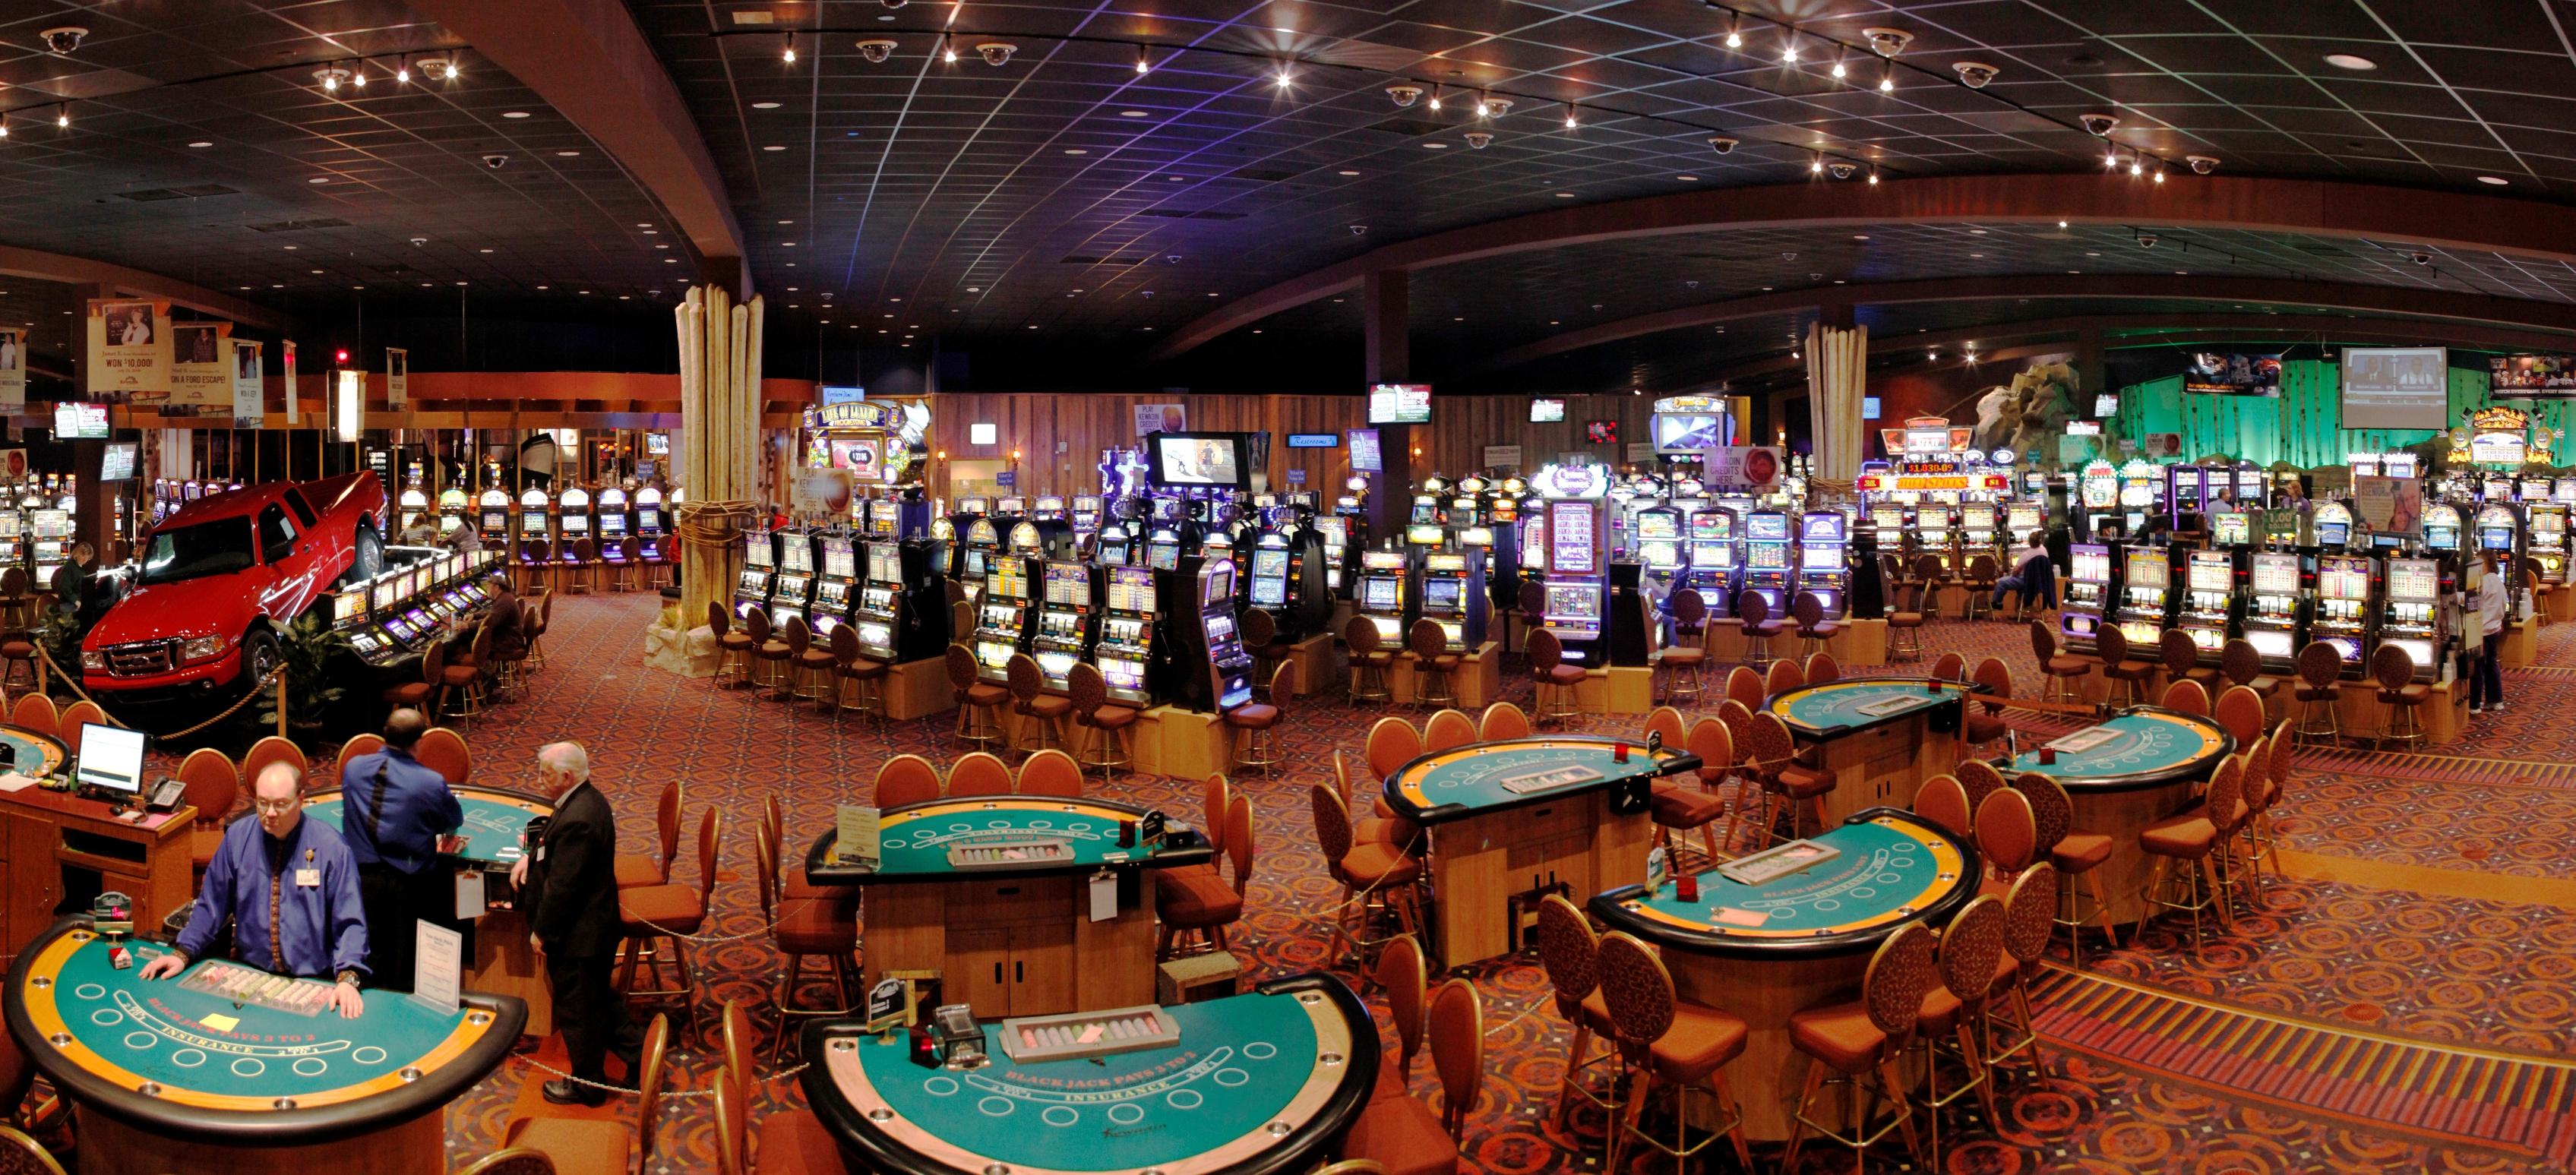 Nice wallpapers Casino 3391x1547px